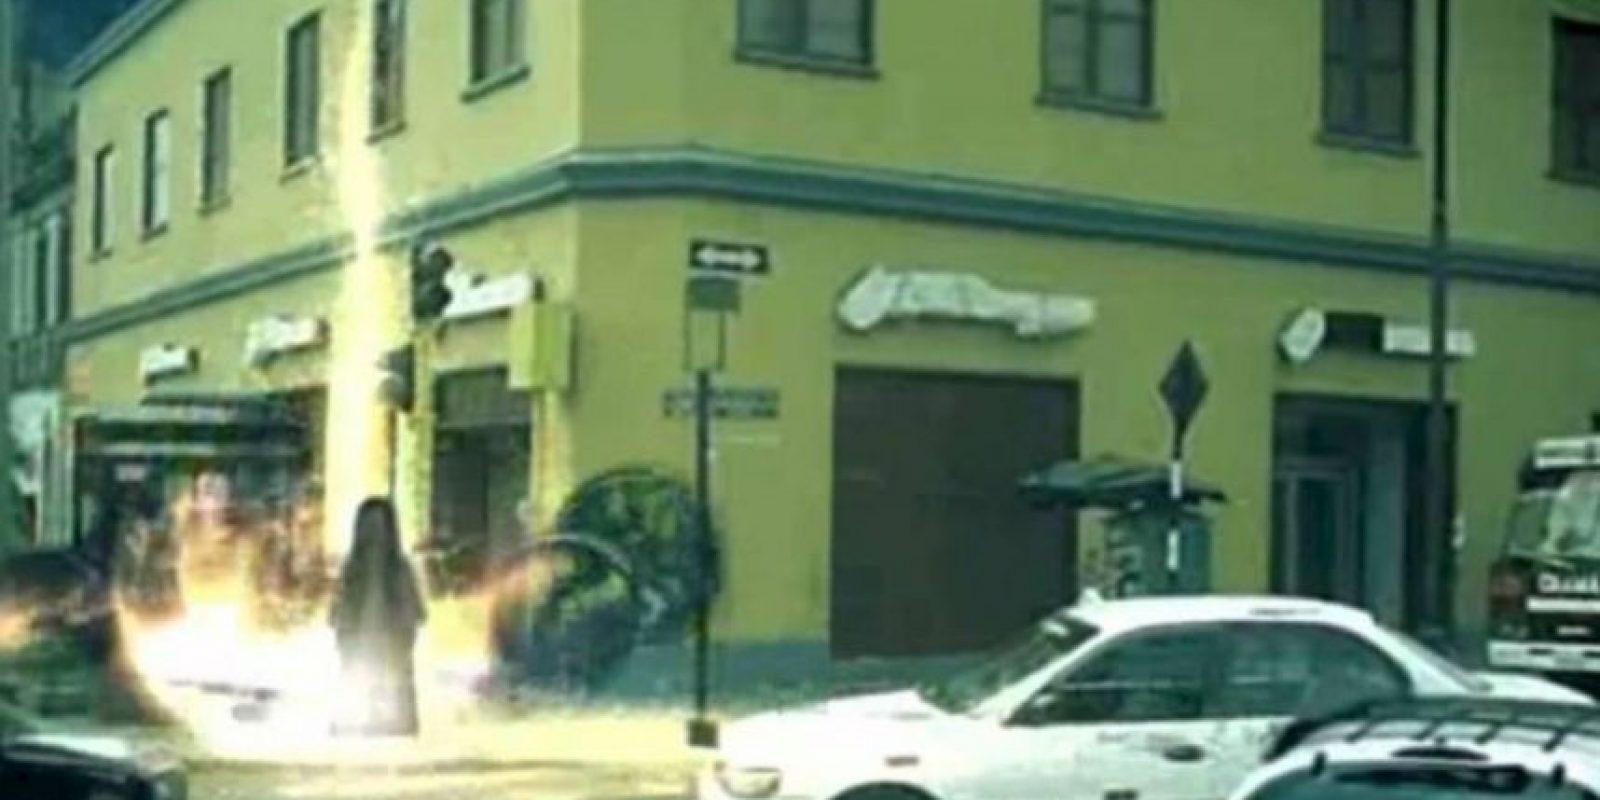 Casa de Matusita (Lima, Perú) Foto:Youtube